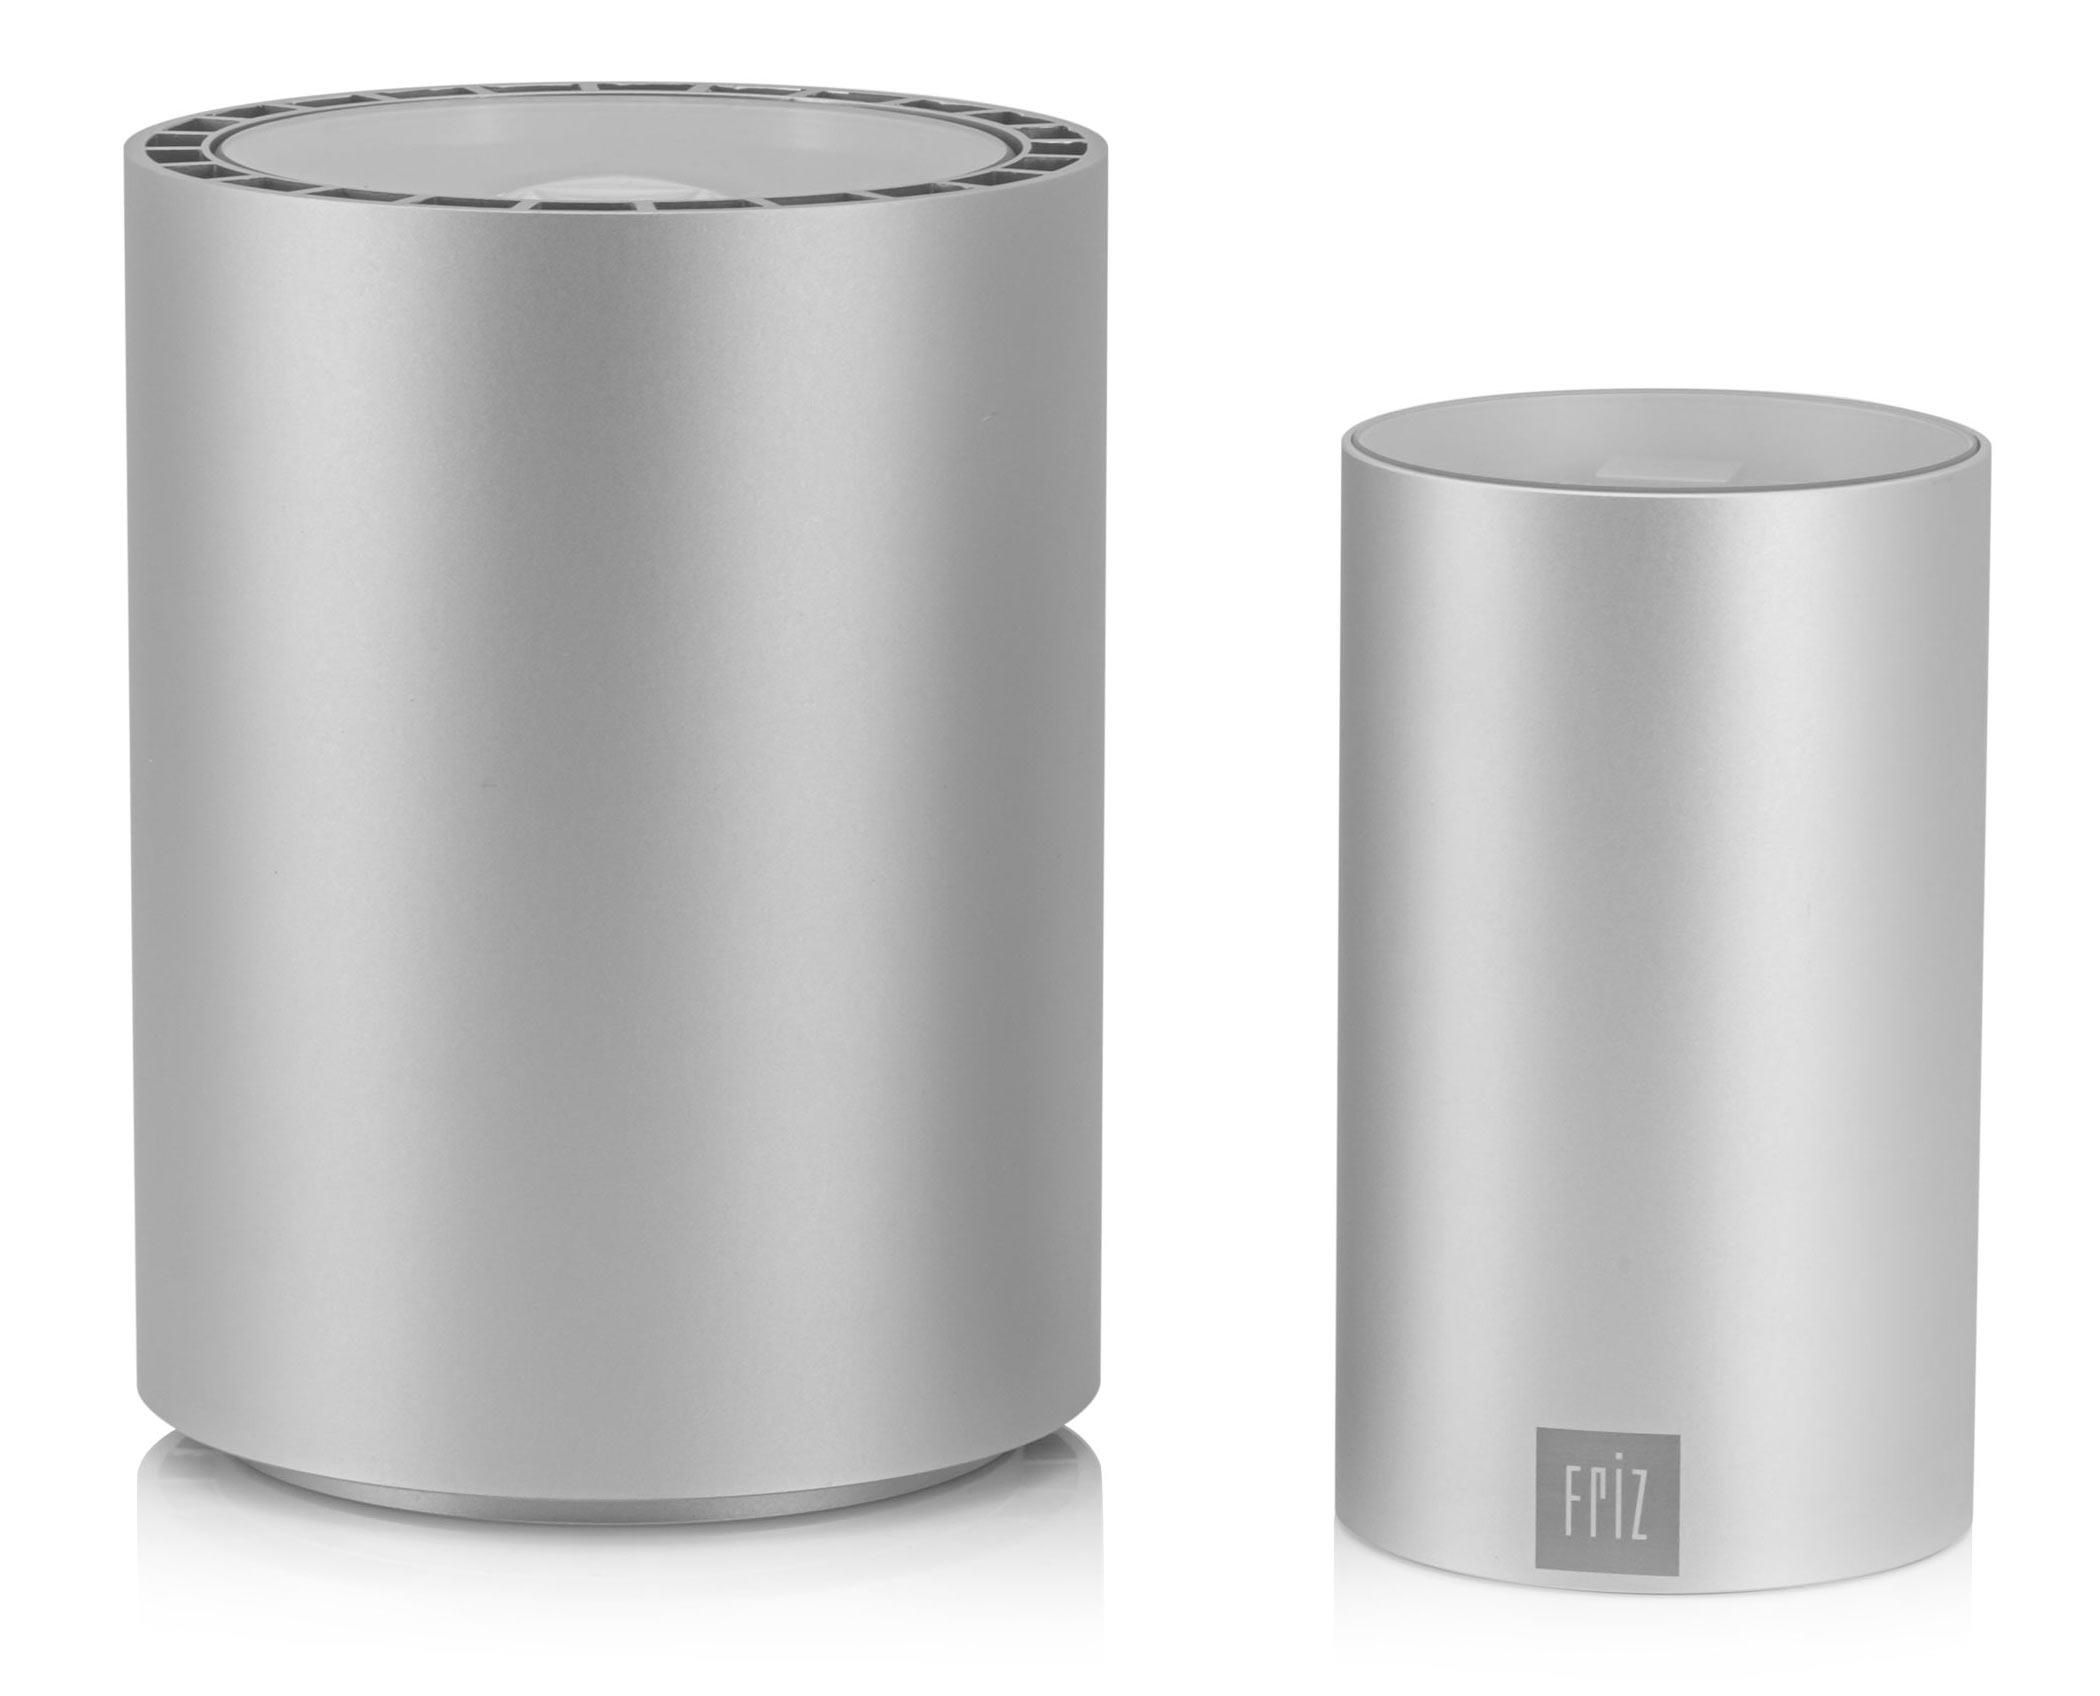 FRIZ CAN und PowerCAN LED Strahler kabellos mit Akku in Silber